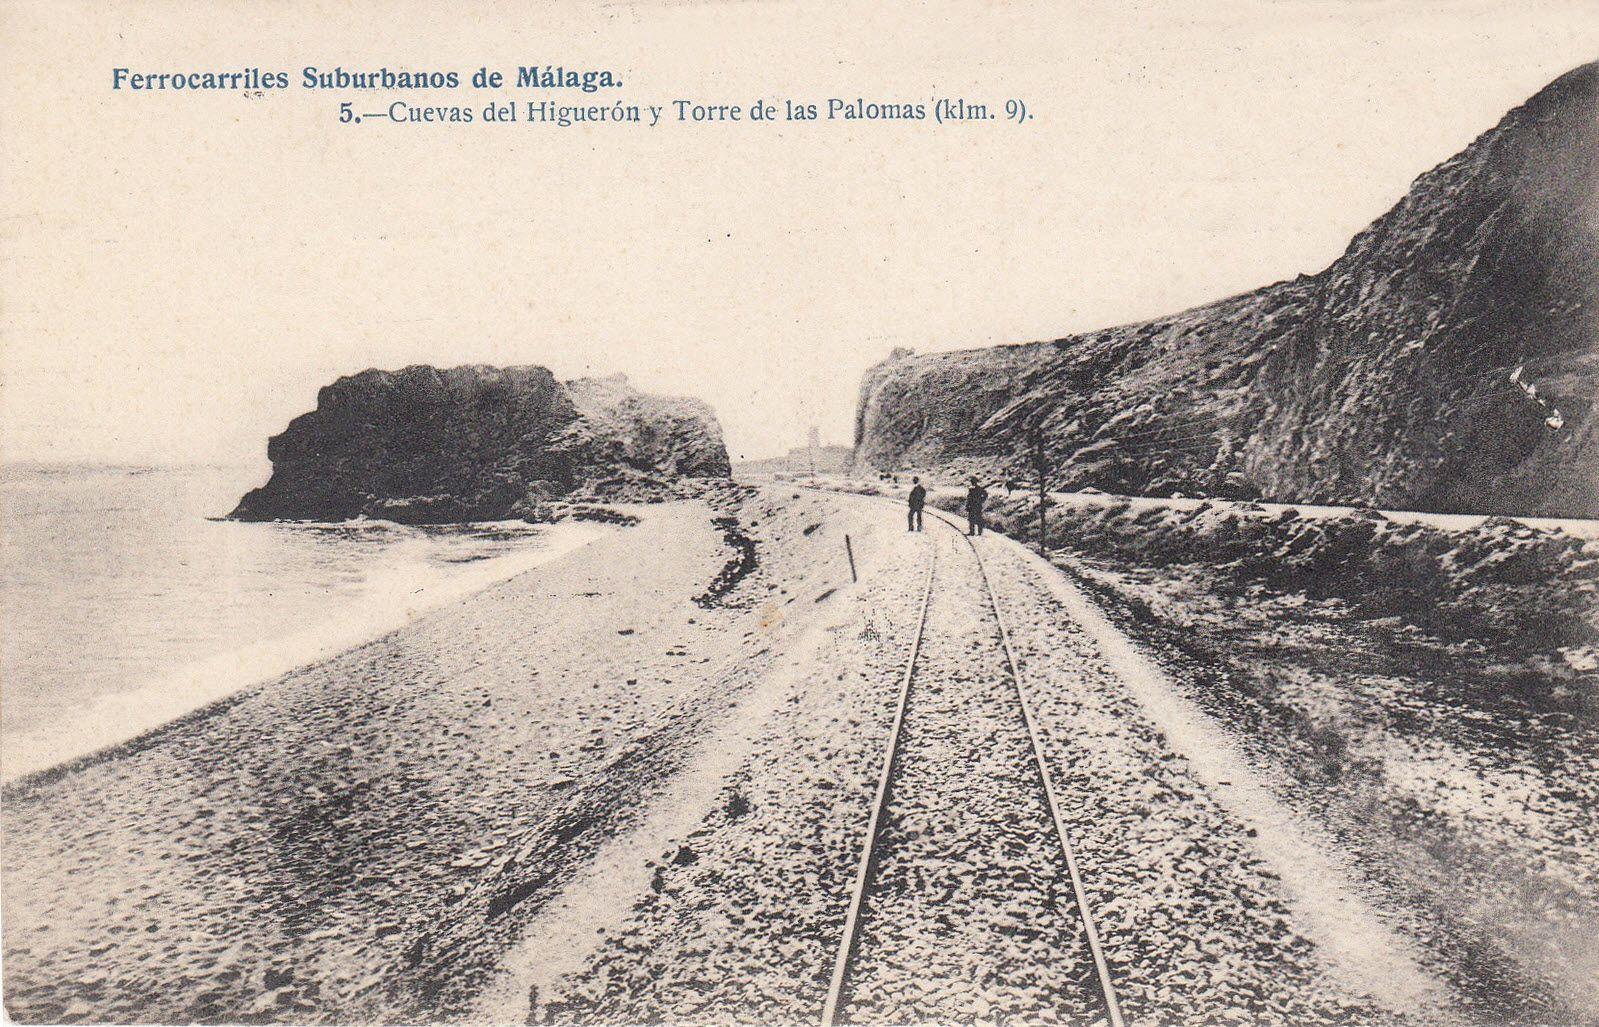 Ferrocarriles Suburbanos de Málaga.